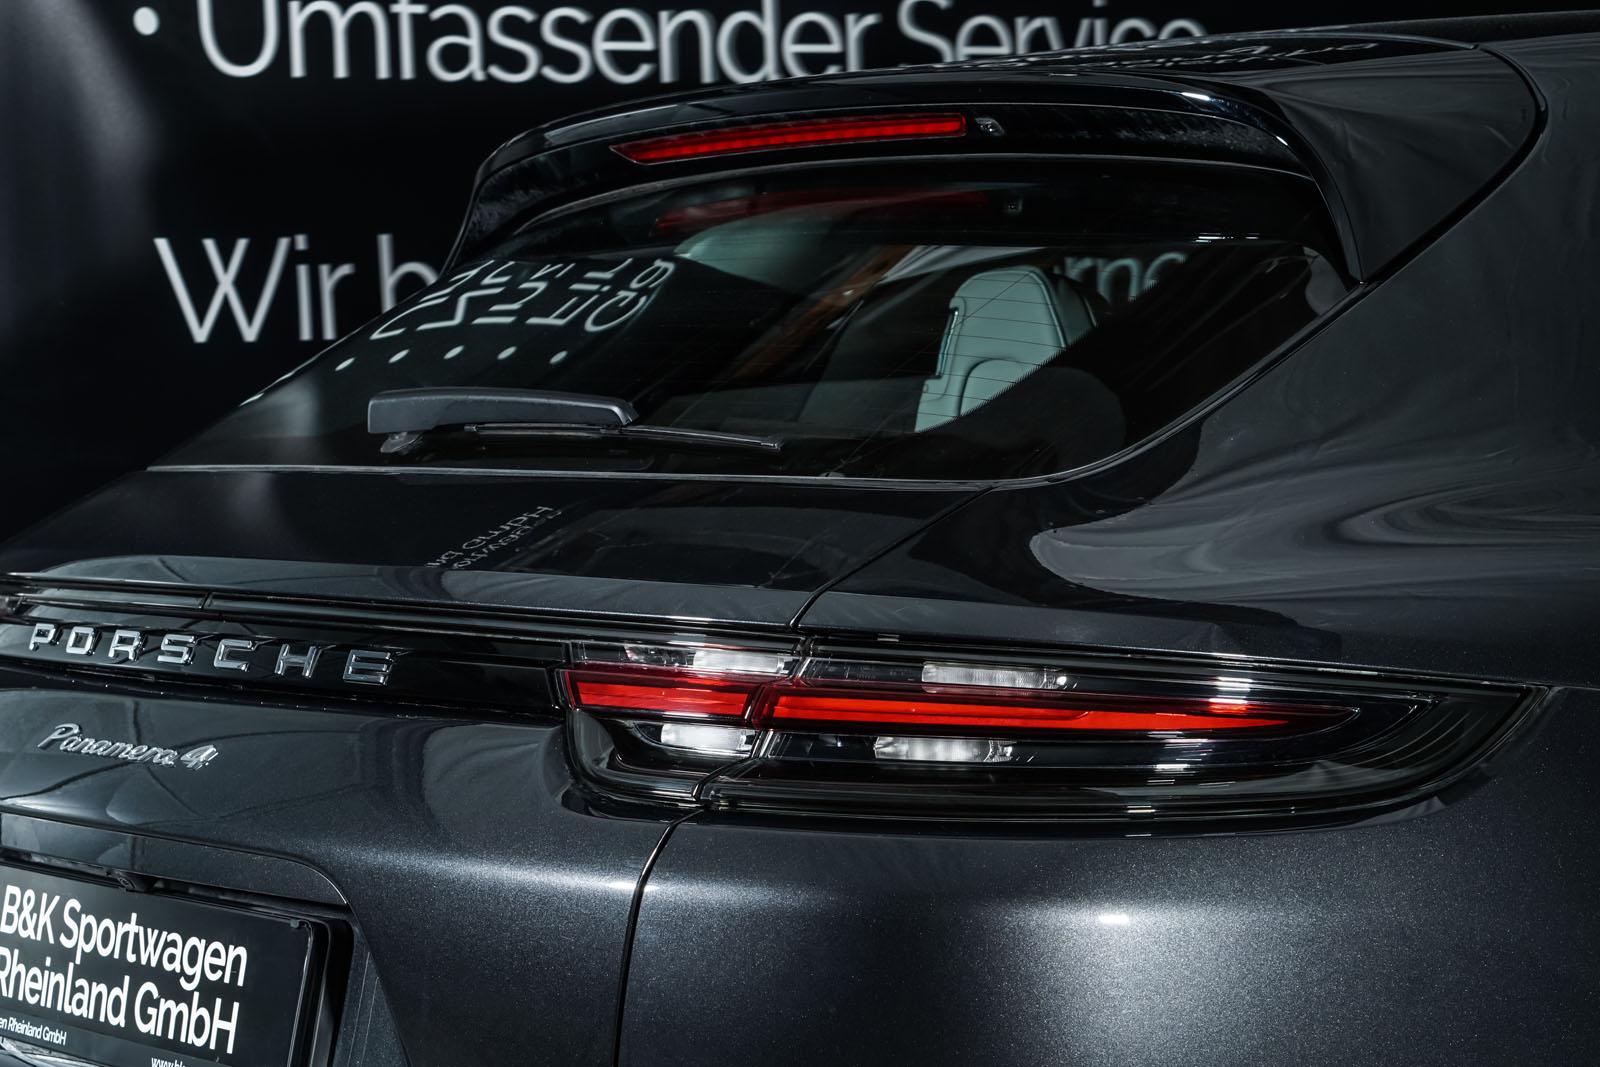 Porsche_Panamera4_SportTurismo_Grau_Weißgrau_POR-0979_23_w